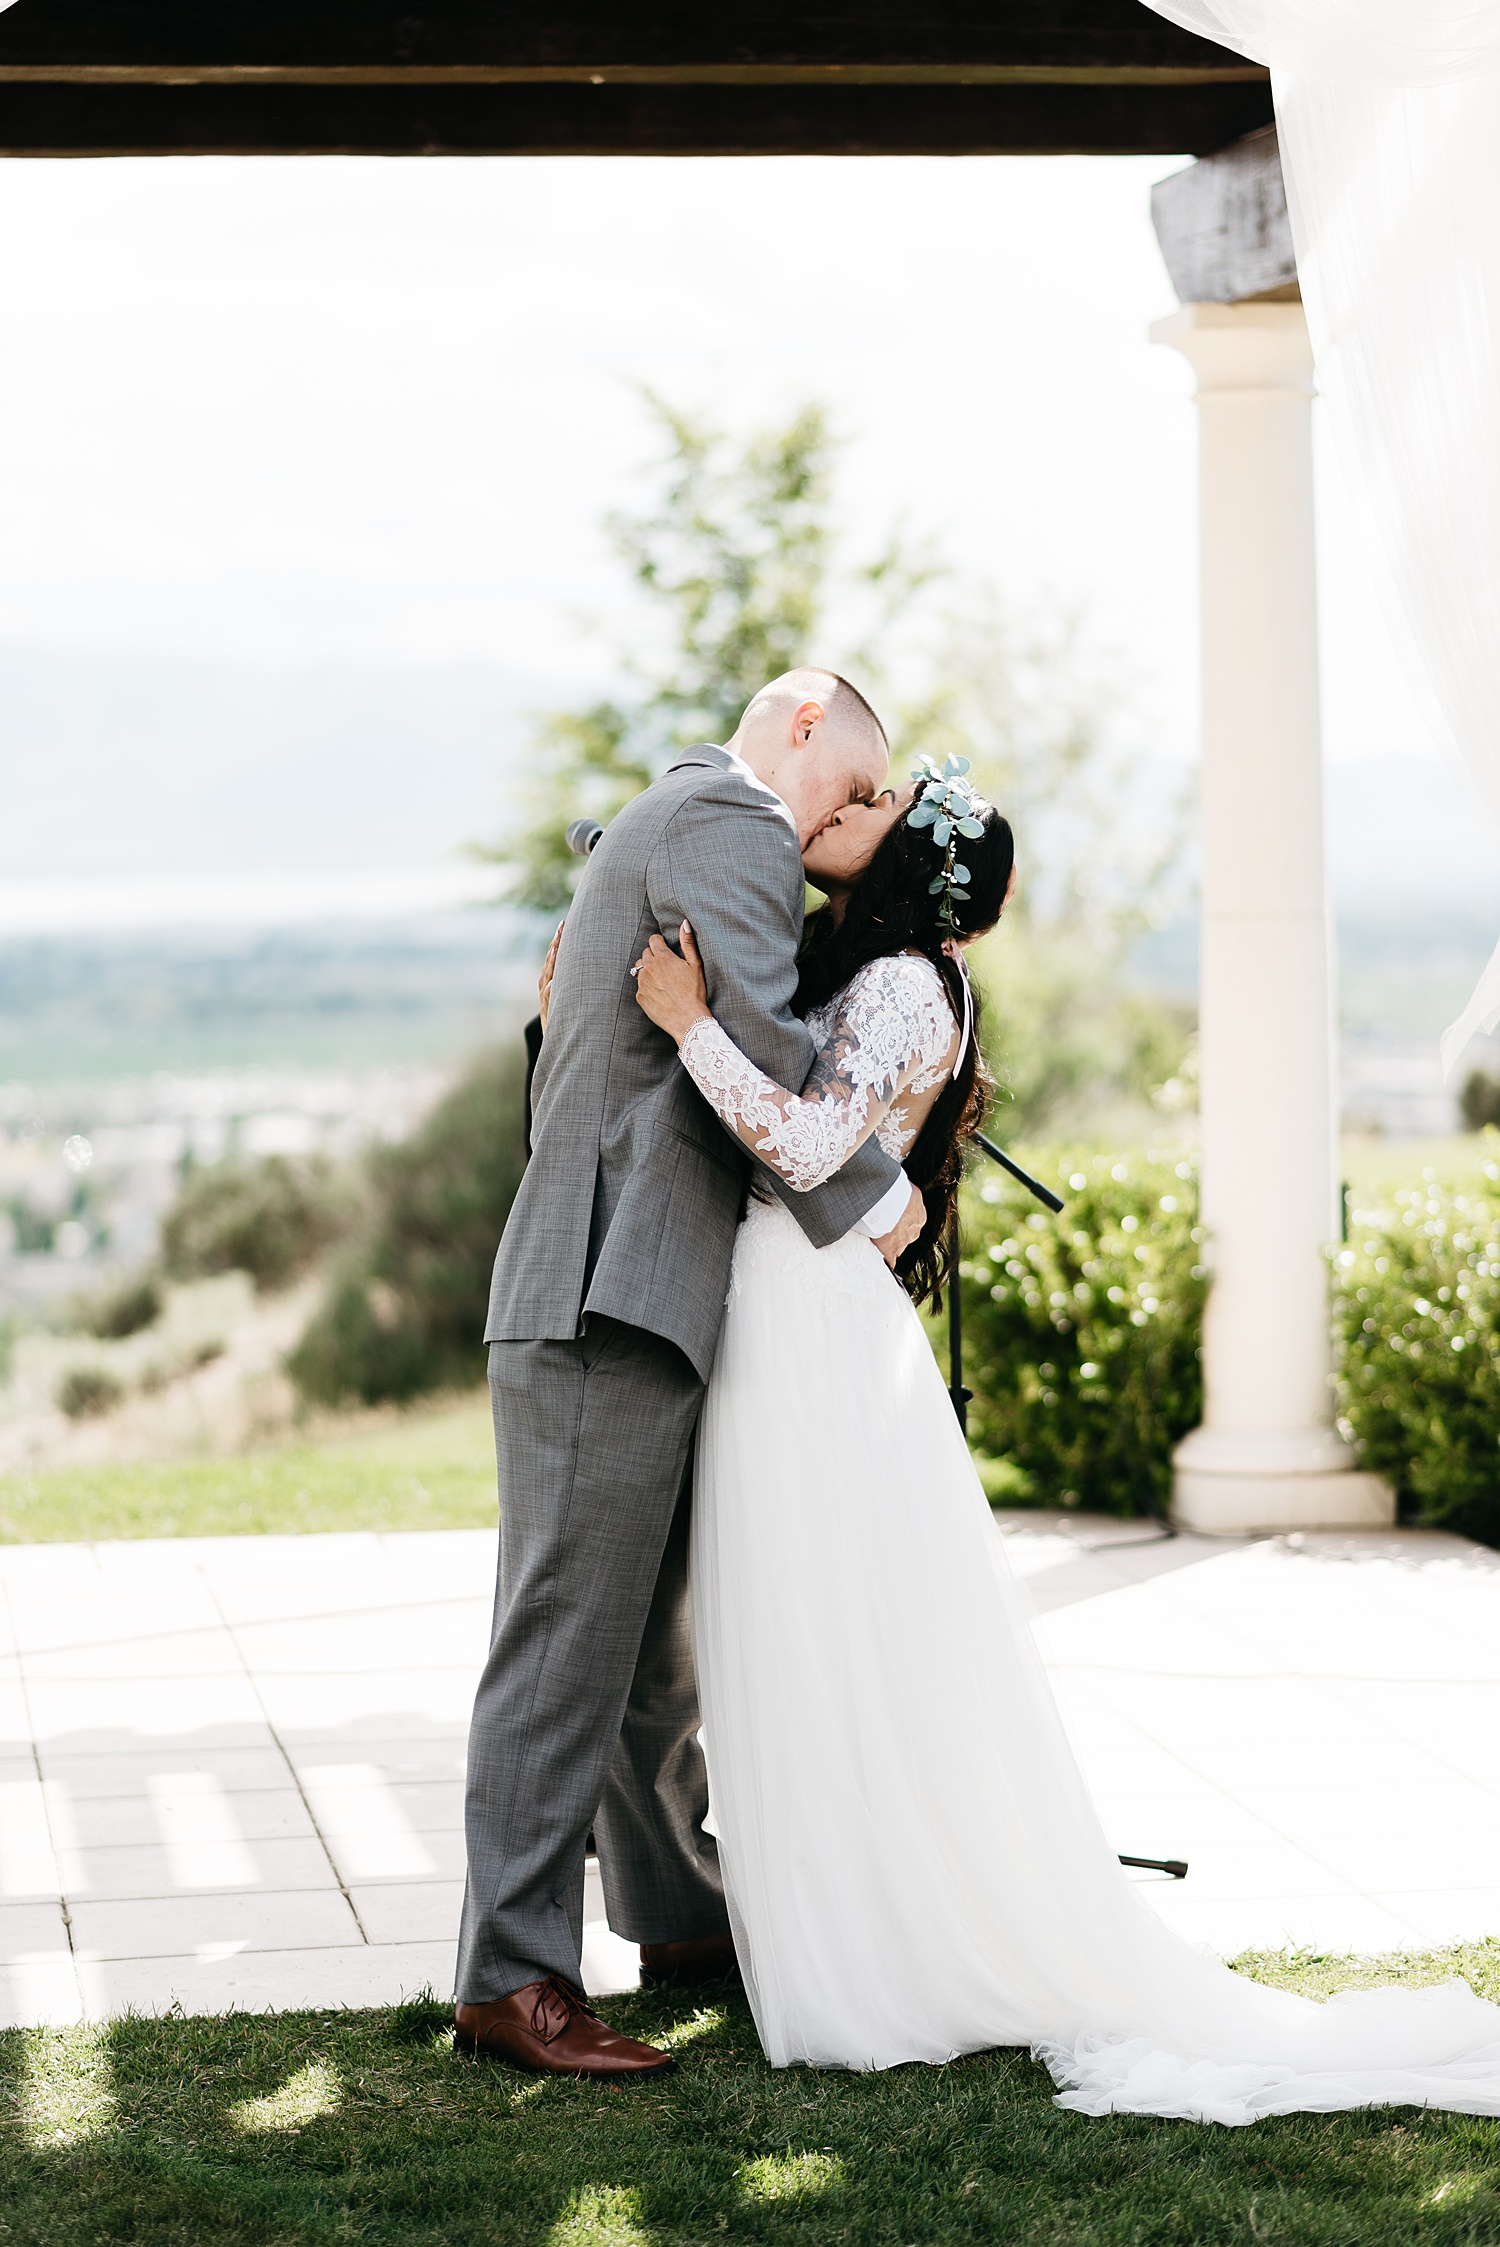 Zandra Barriga Photo - Darian and Colton Wedding_0030.jpg